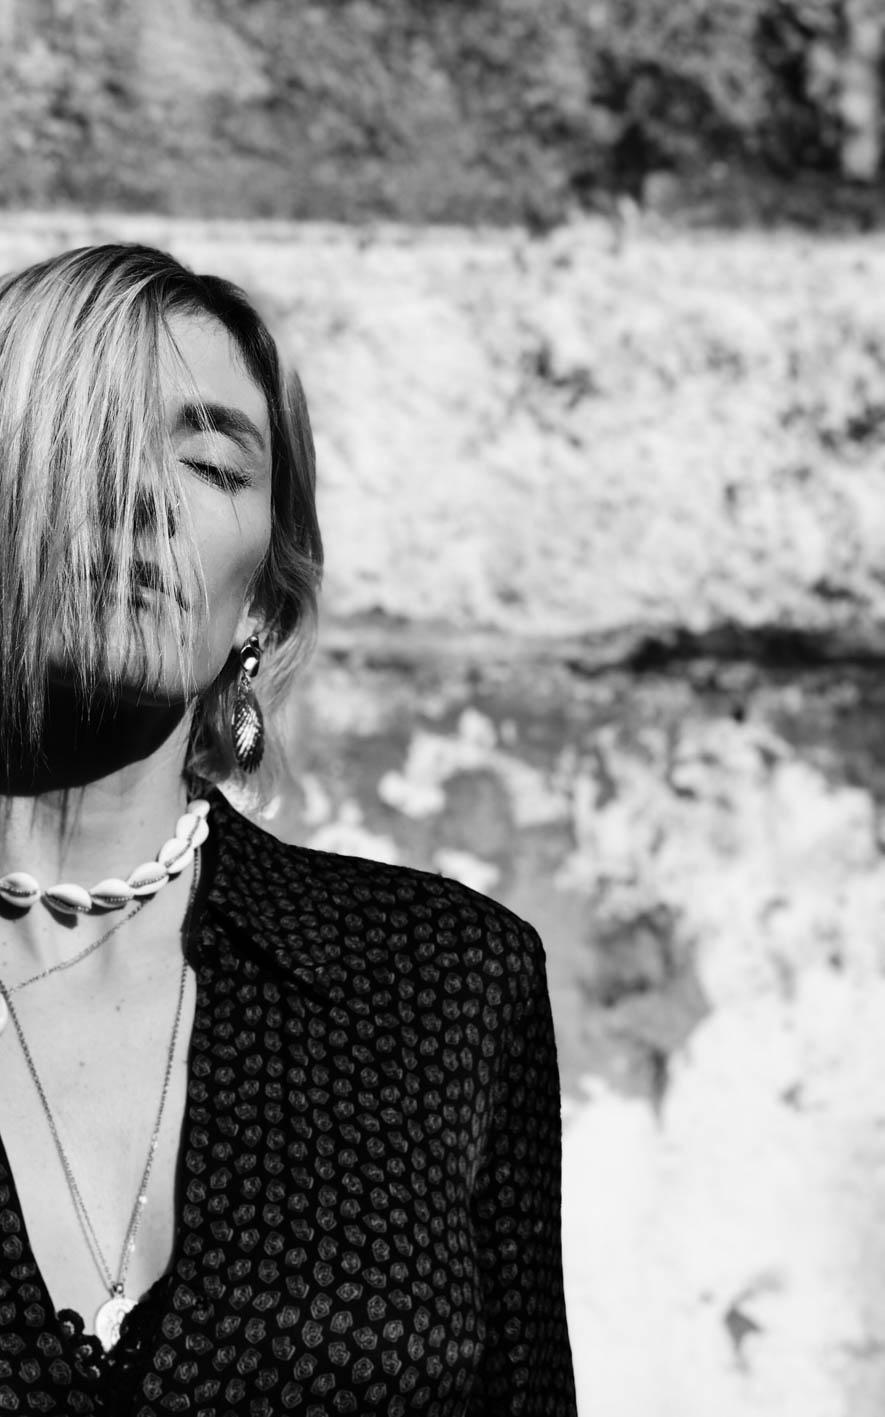 Carnet sauvage- blog mode et tendances - Bijoux coquillages16.jpg